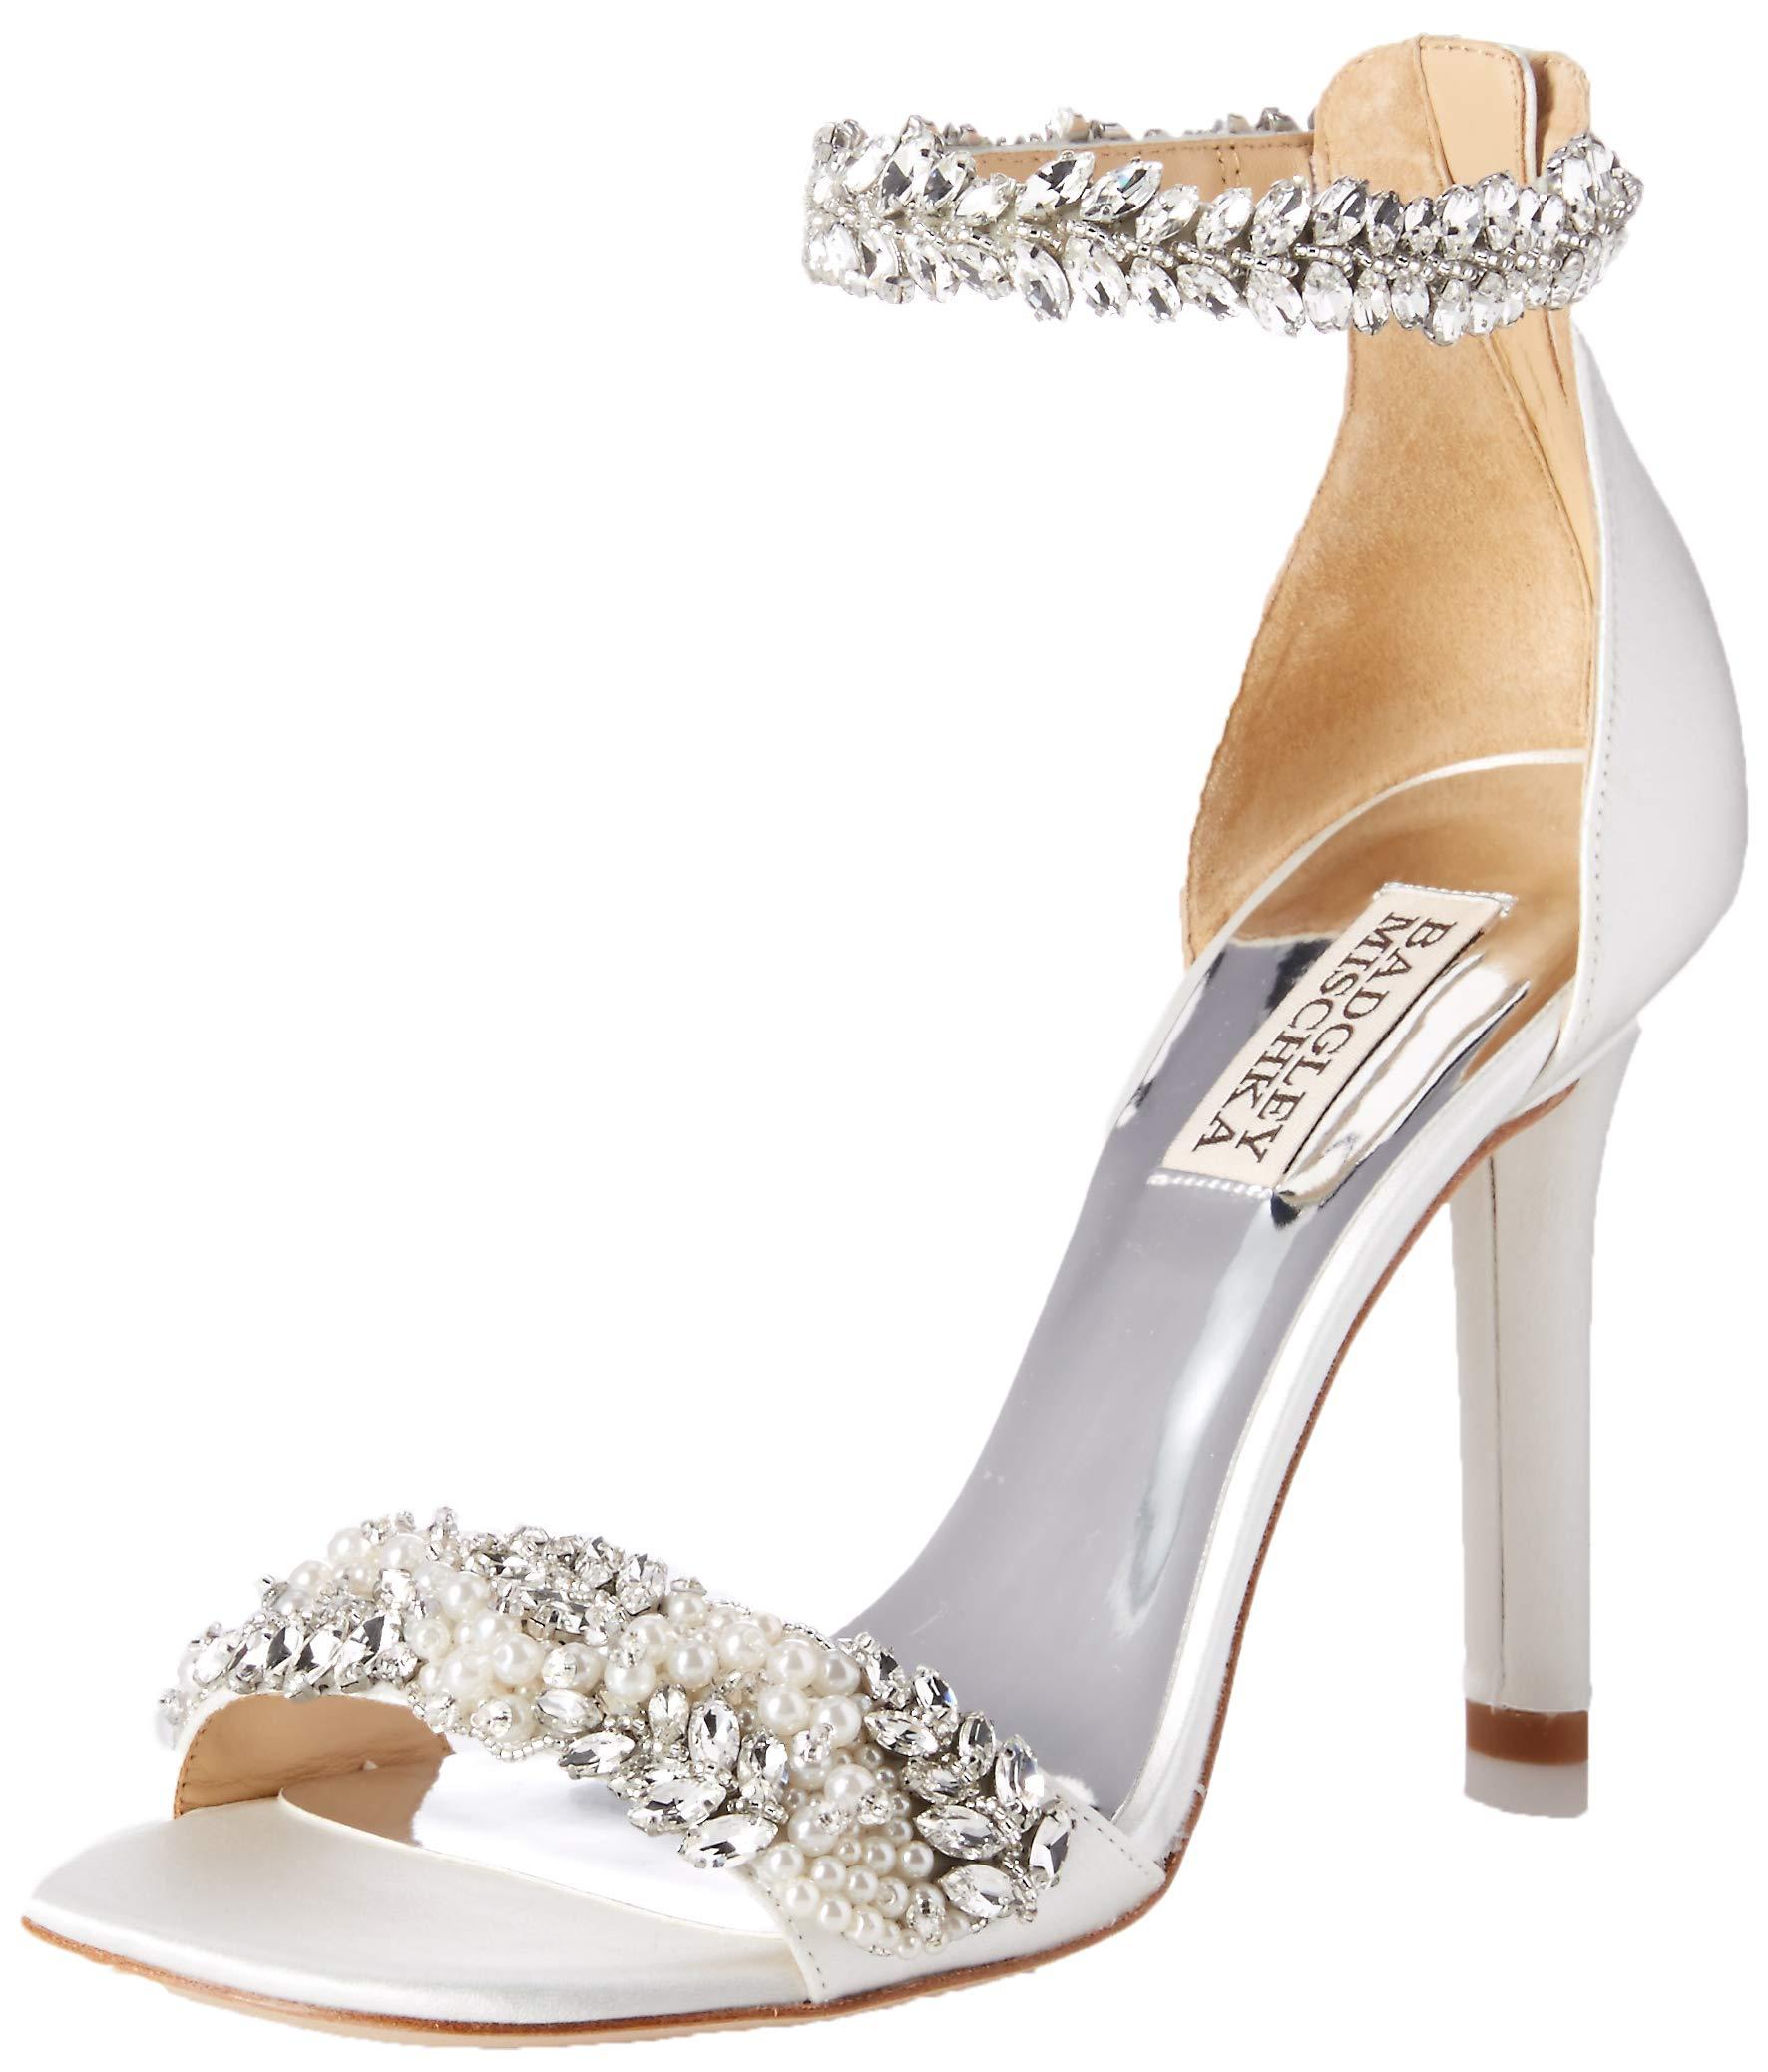 Badgley Mischka Women's Fiorenza Heeled Sandal White Satin 6 M US